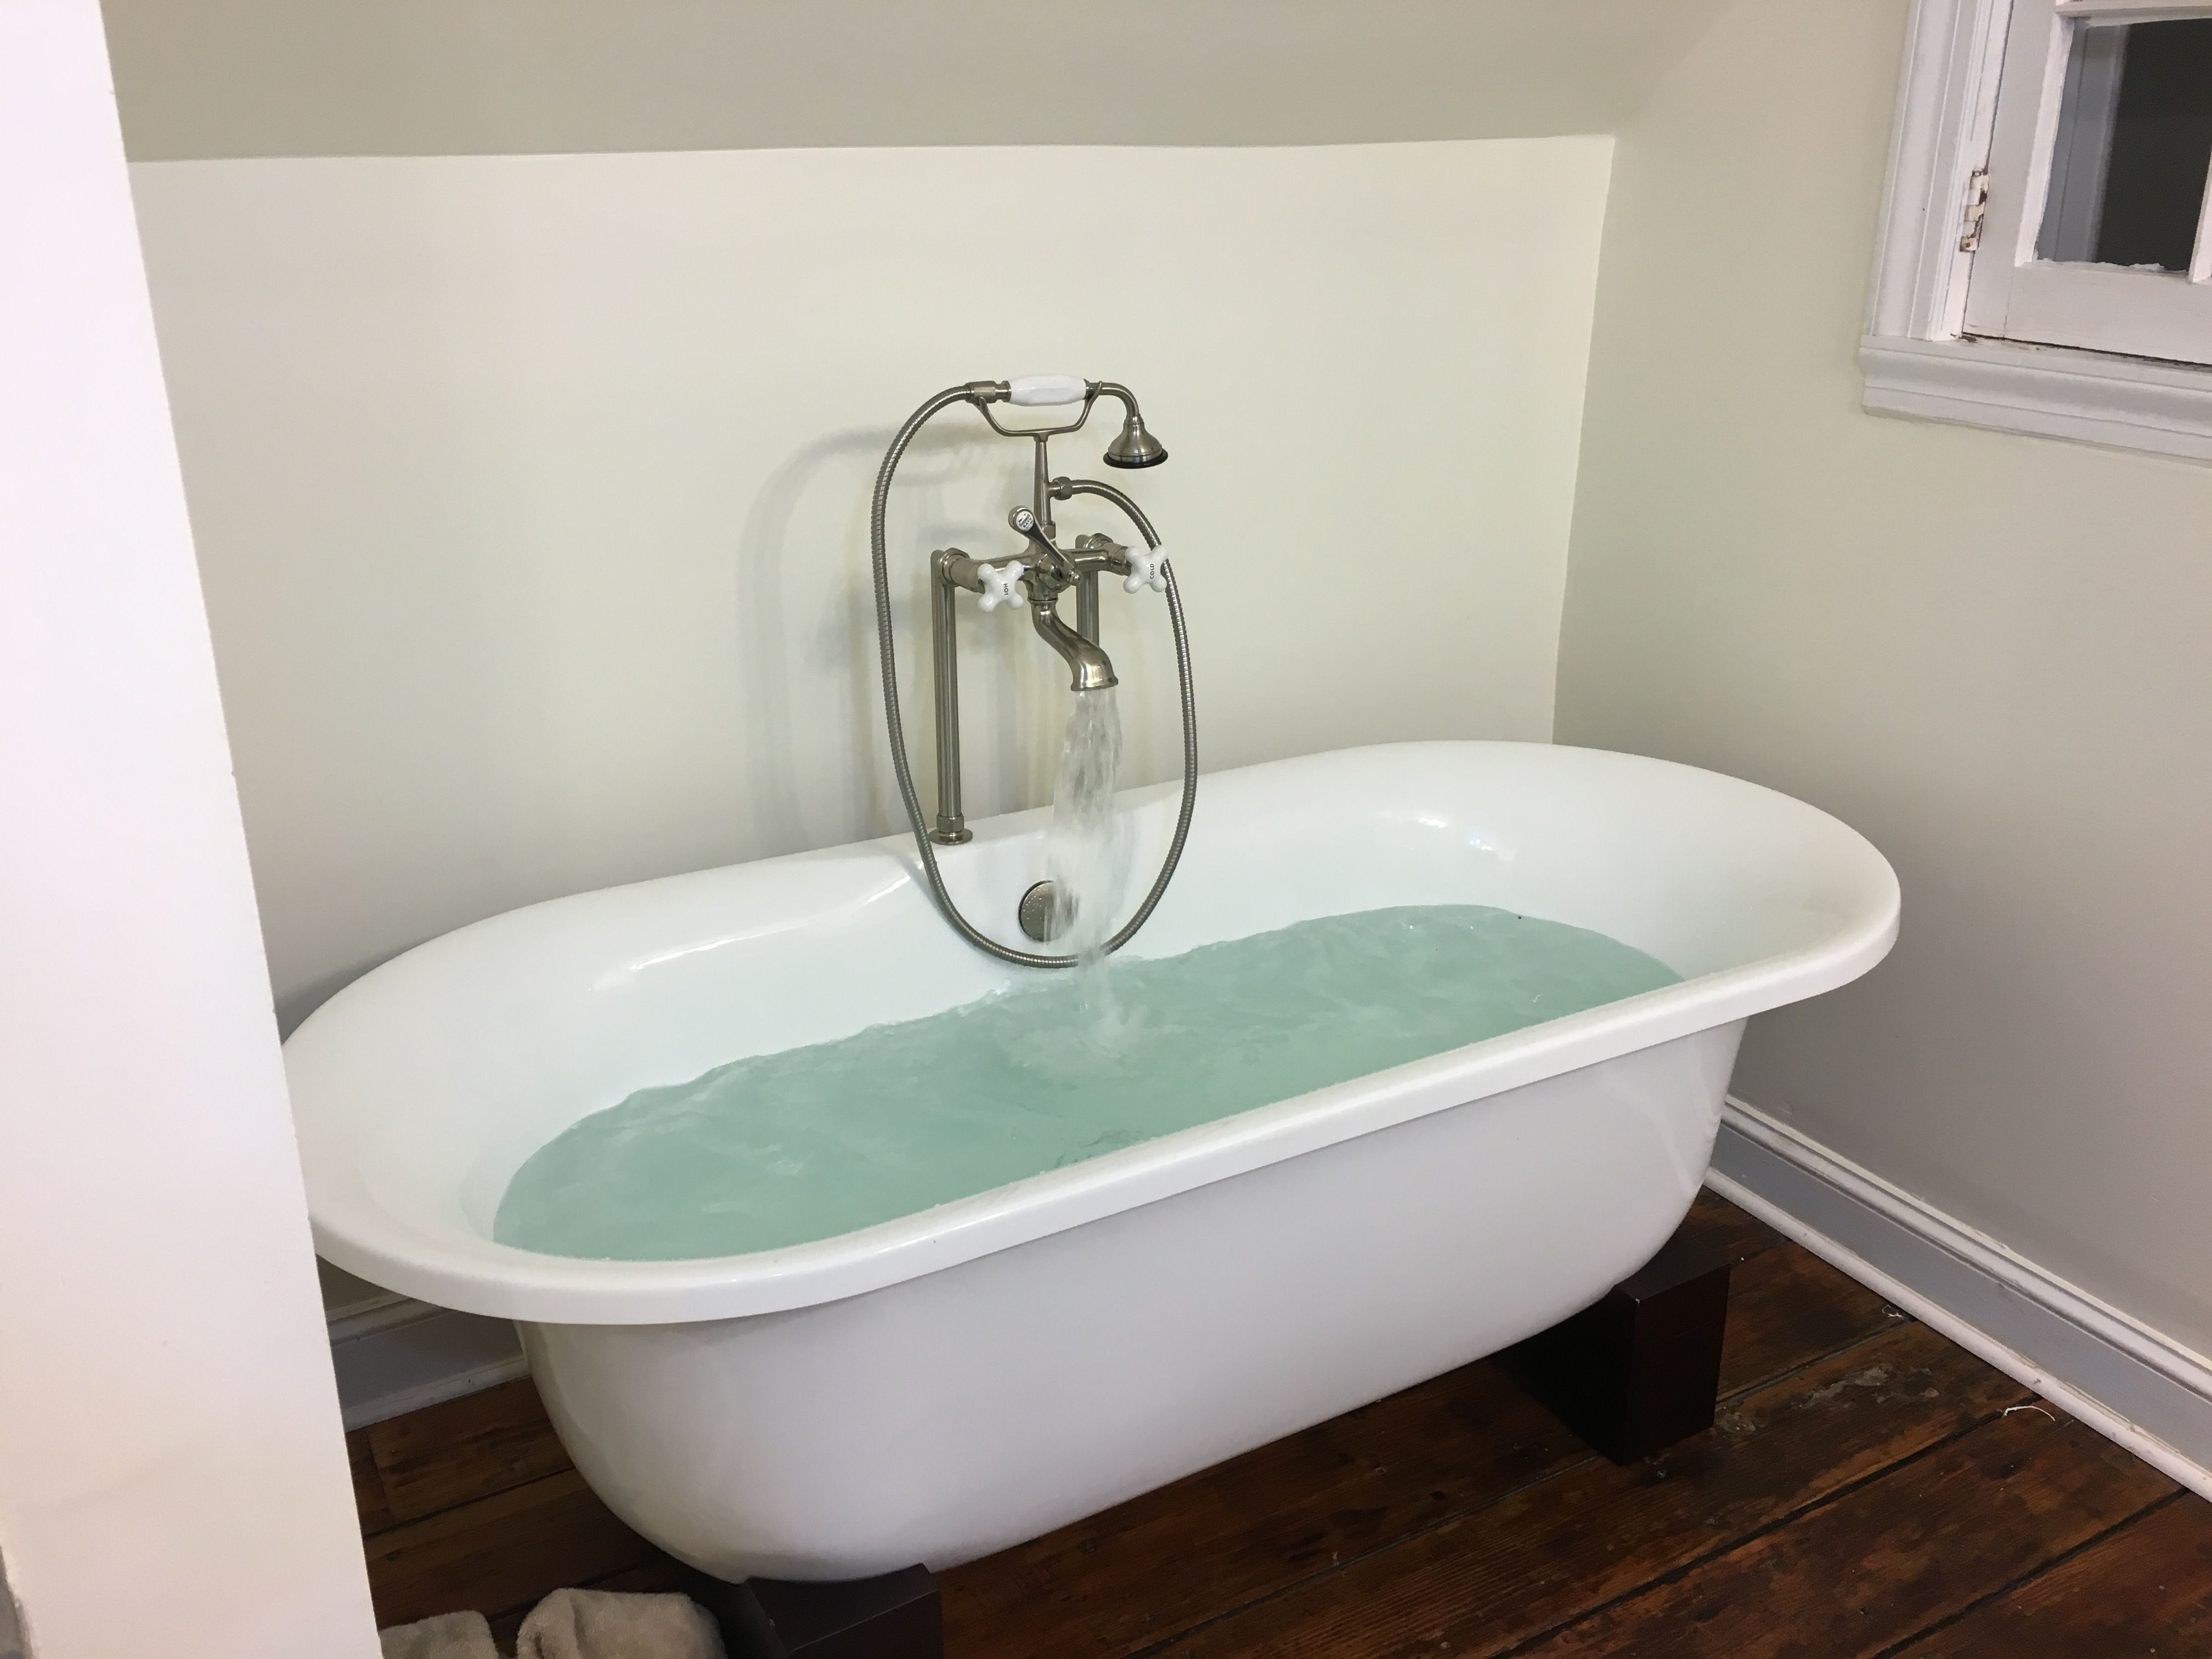 fiberglass free standing tub. Inspiring Fiberglass Free Standing Tub Gallery  Best inspiration